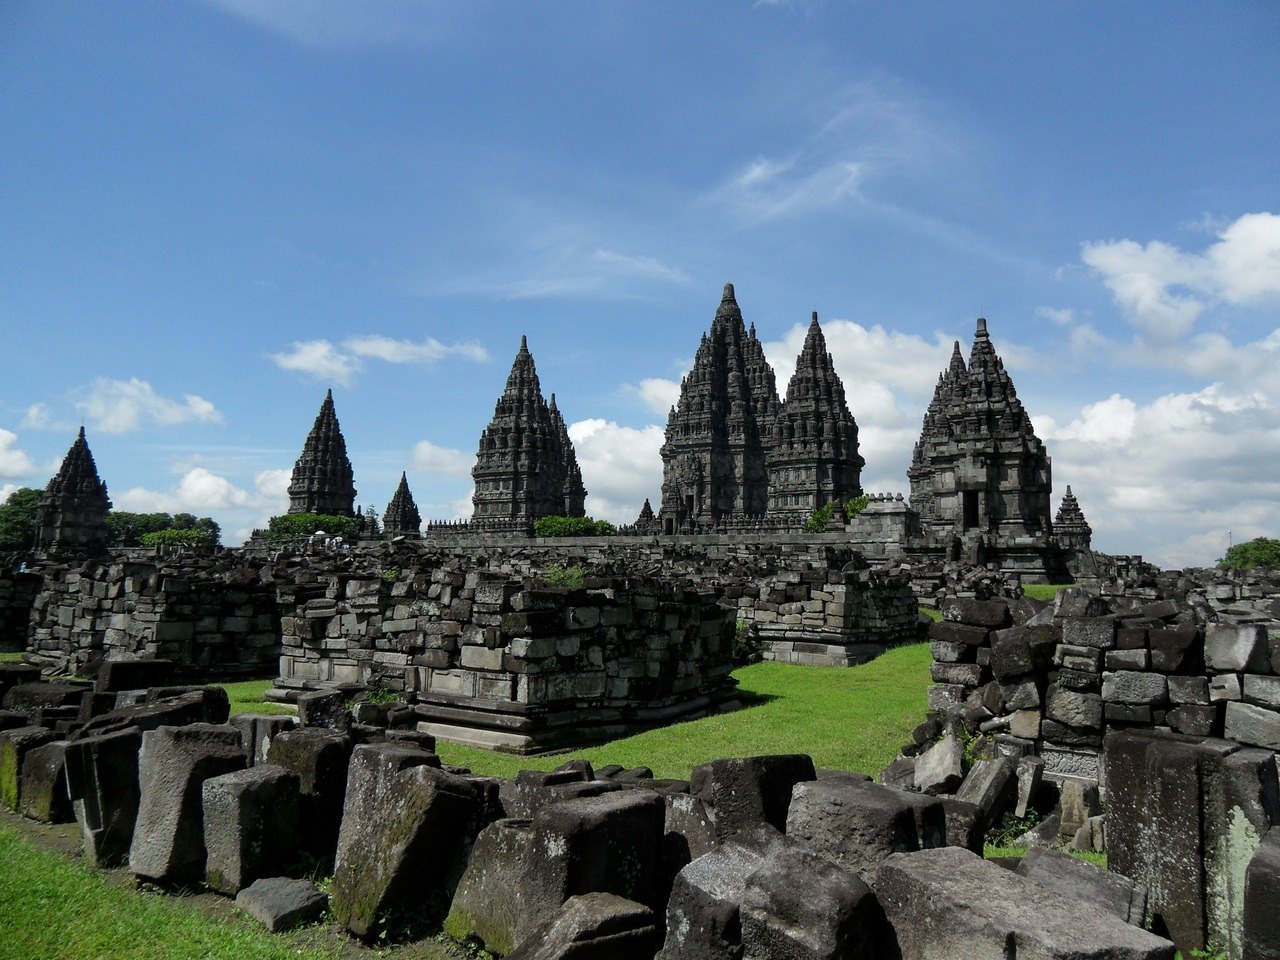 prambanan-temple-java-hinduism-161293.jpeg